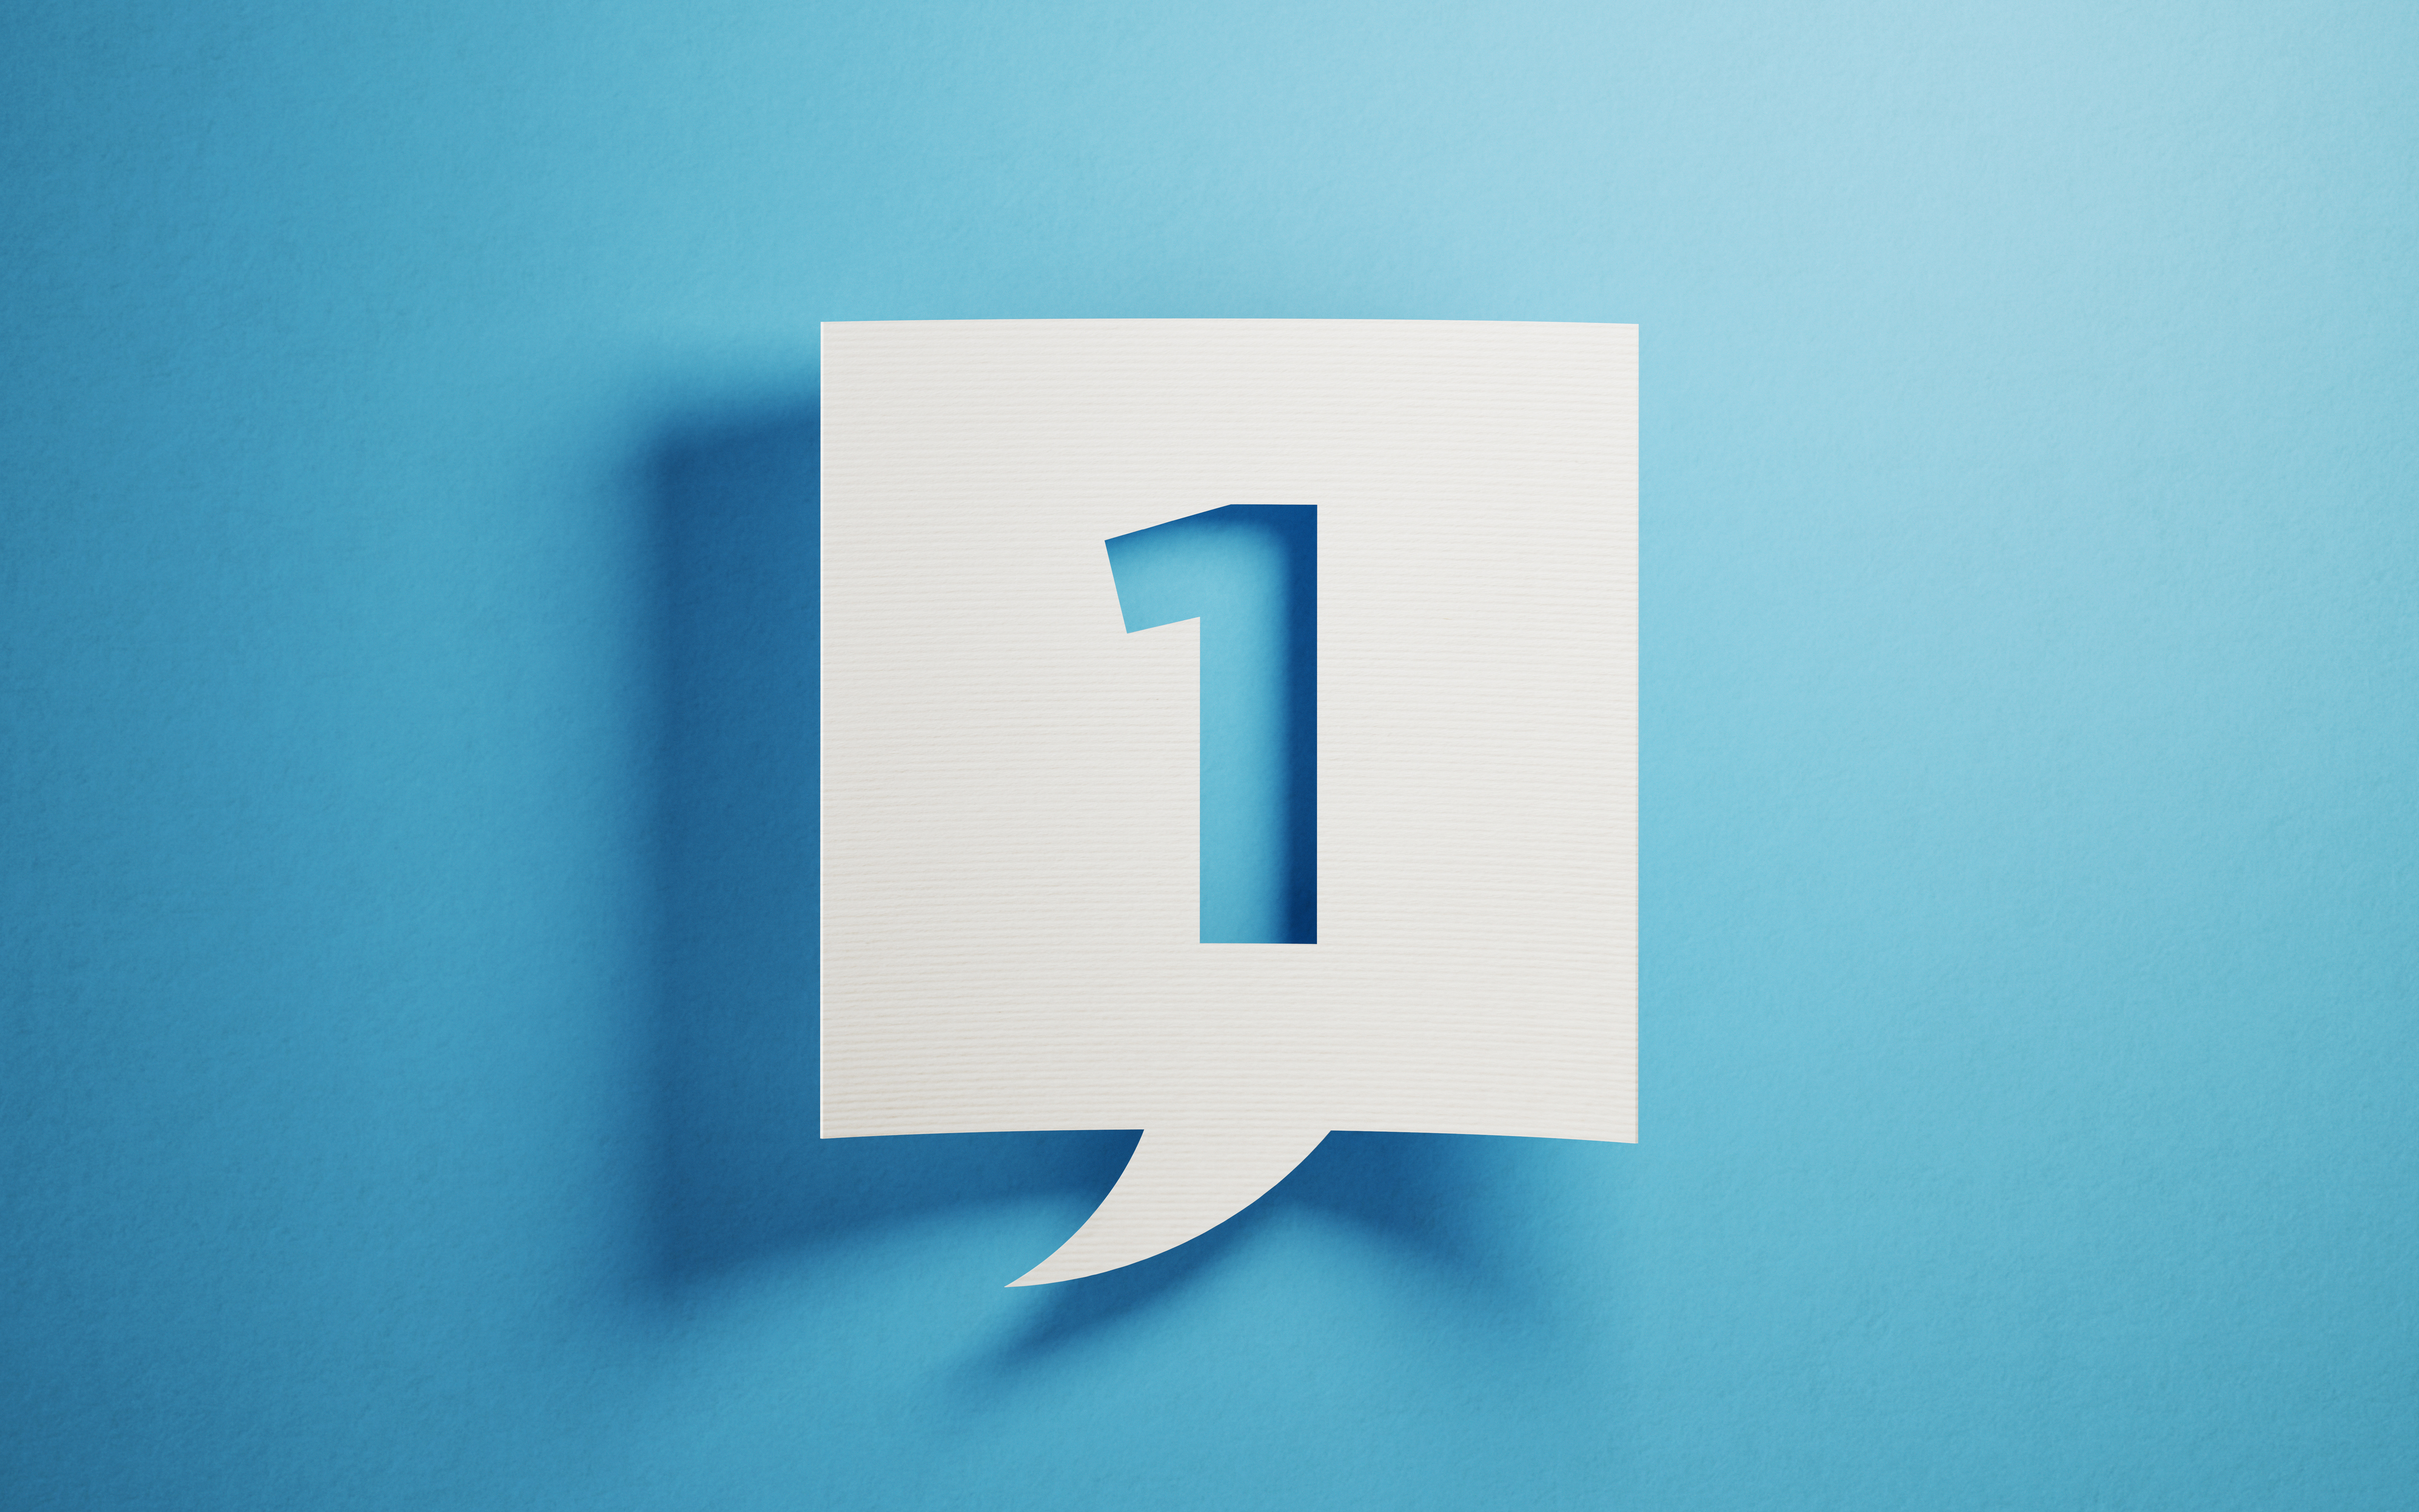 G2 blog post